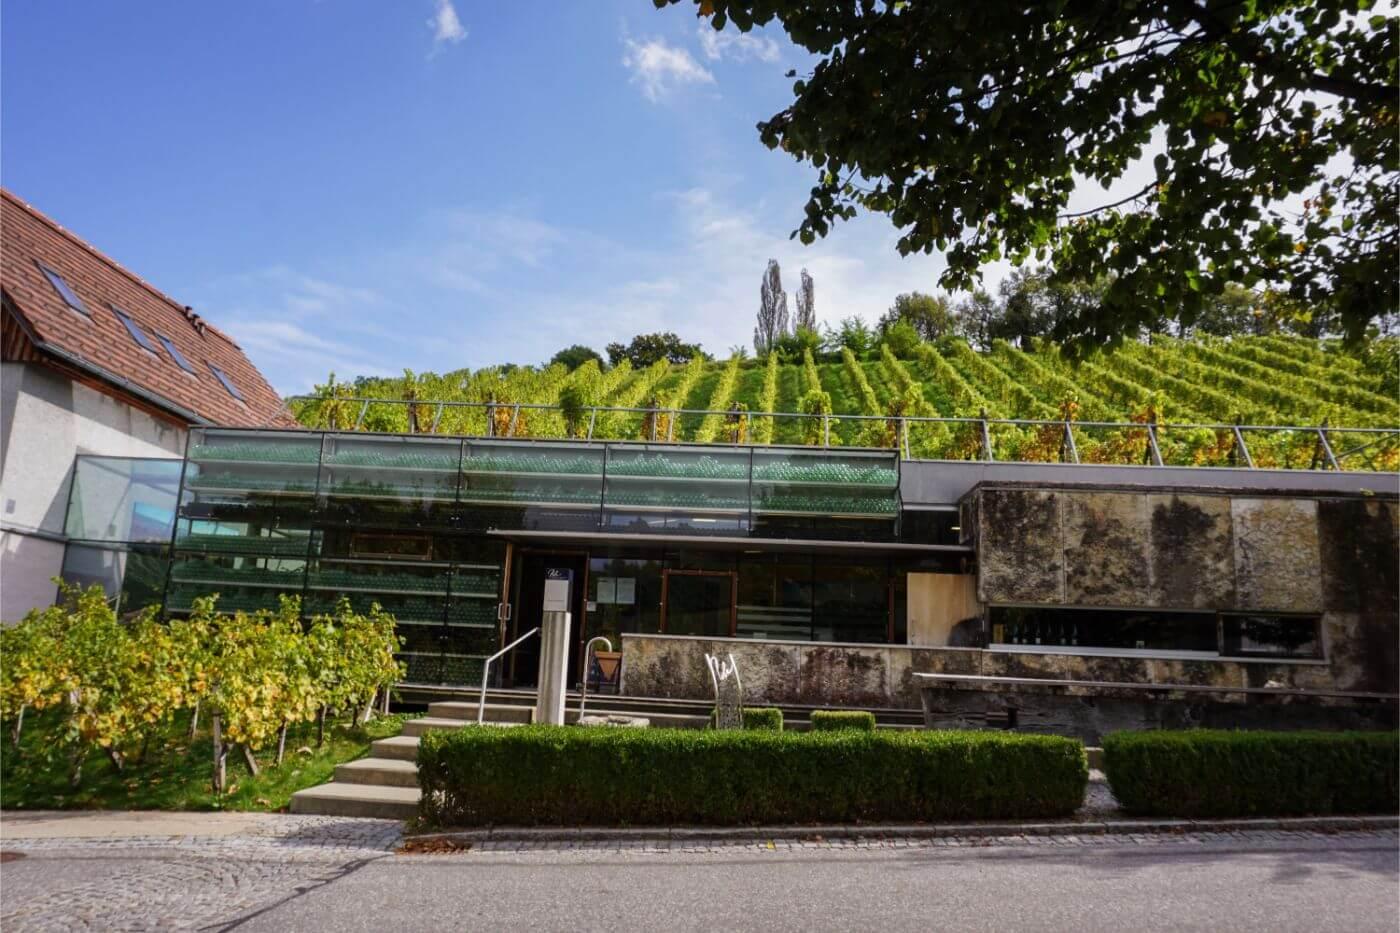 Weingut Erich & Walter Polz, Wineries in South Styria, Austria